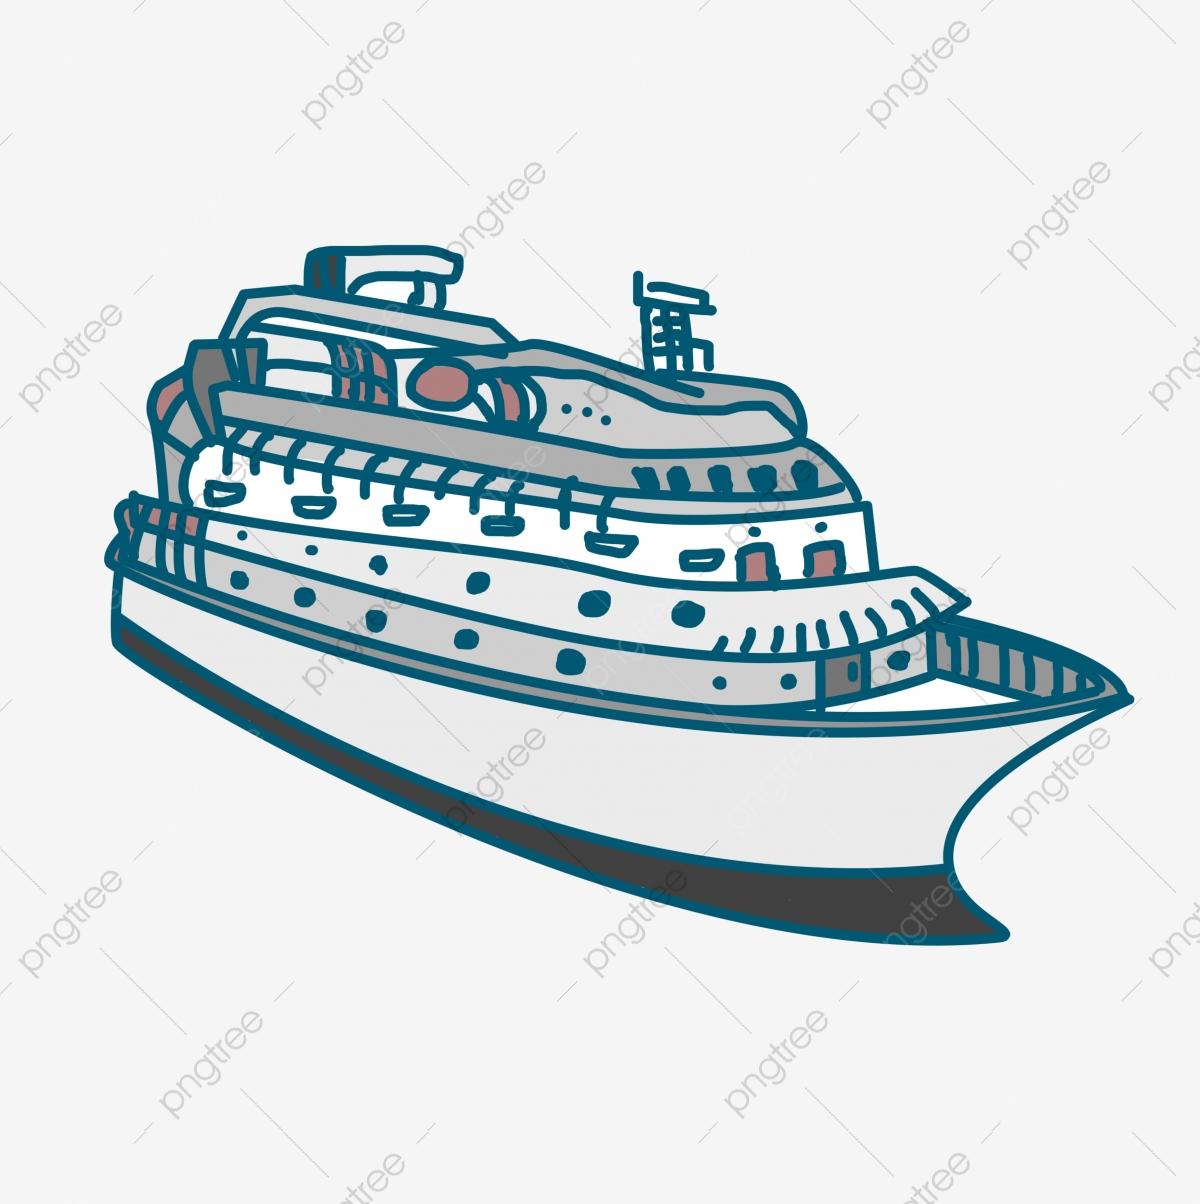 Maritime traffic transportation hand. Cruise clipart sea ship